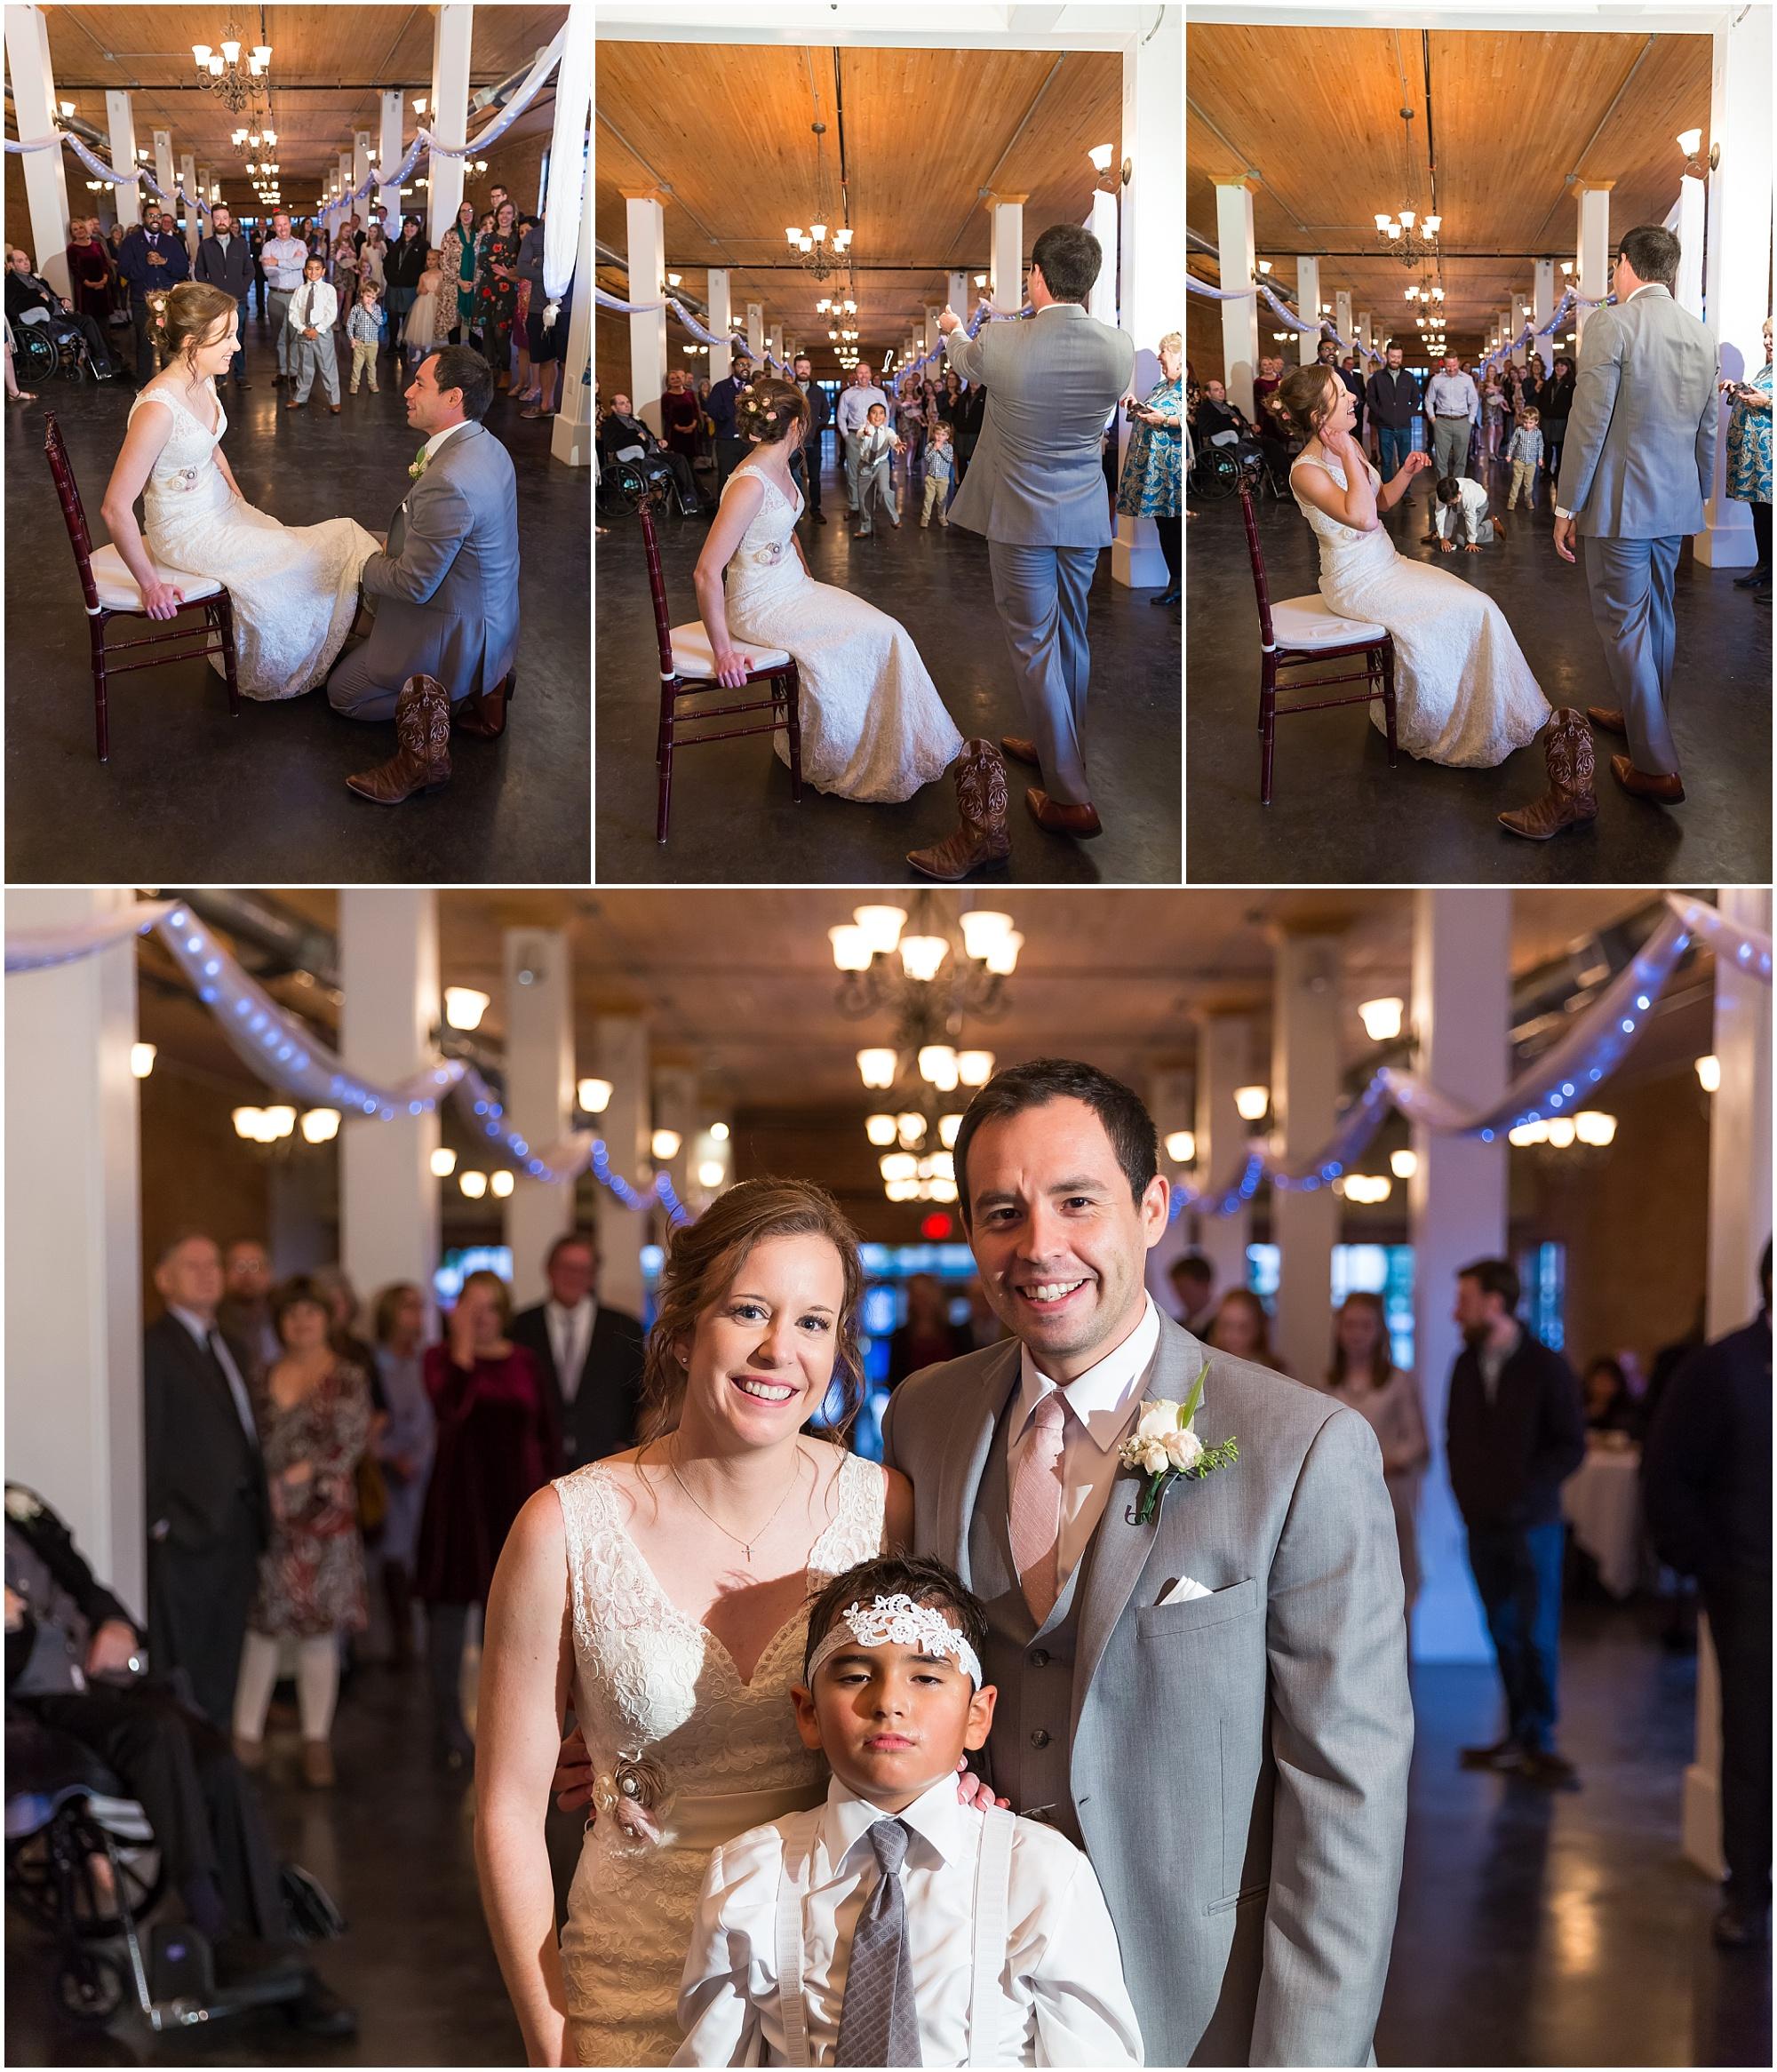 Downtown-Waco-Fall-Wedding_0041.jpg